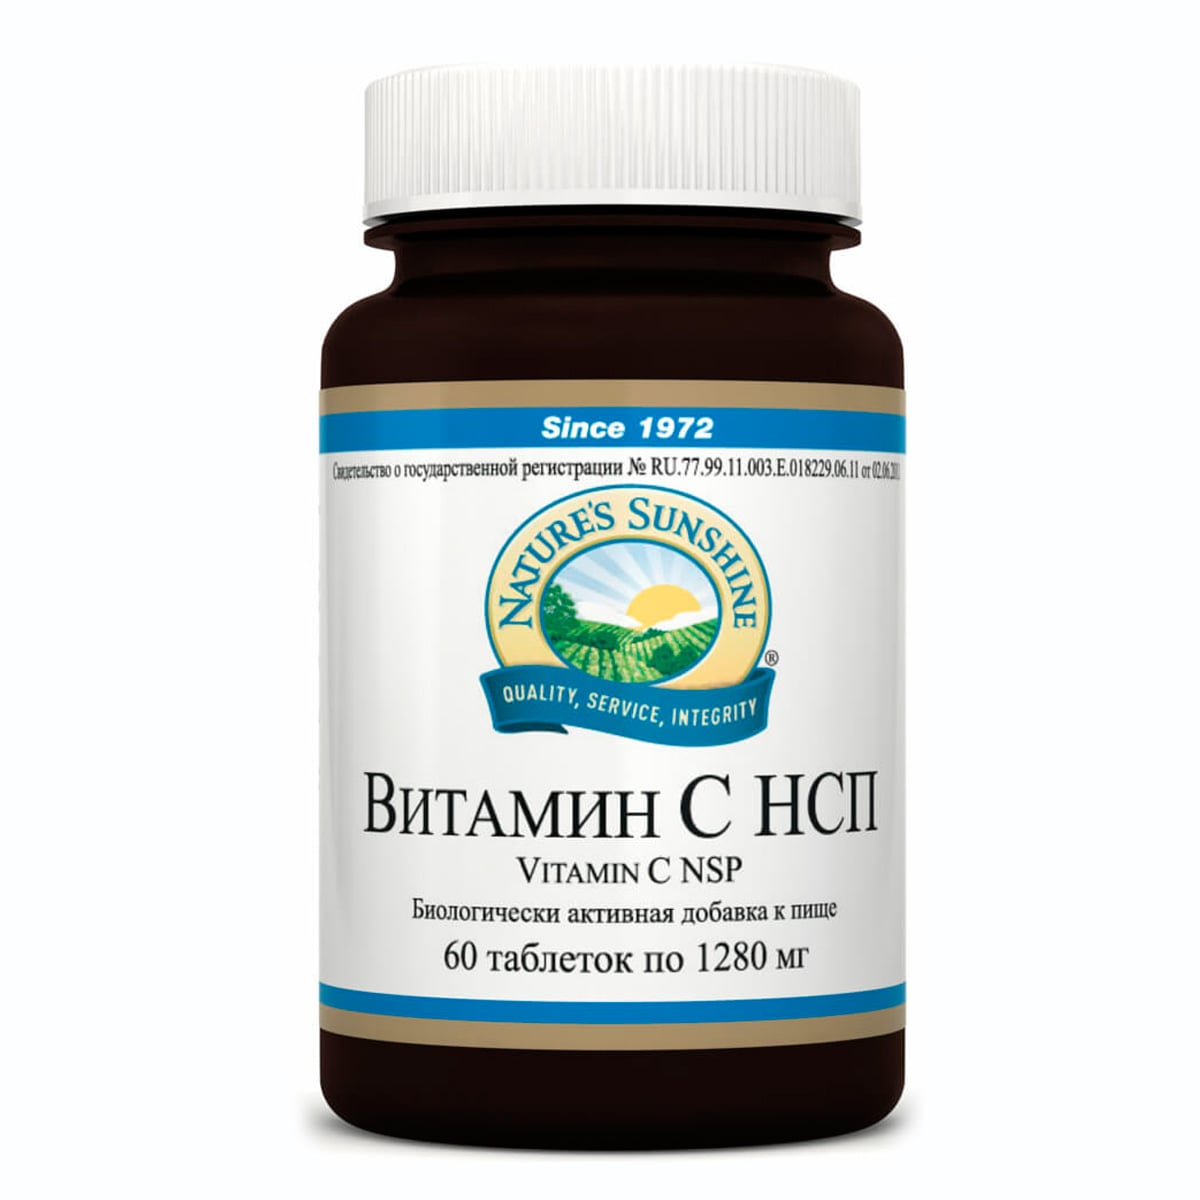 vitamin—с—nsp - Цистит у женщин. Профилактика и лечение